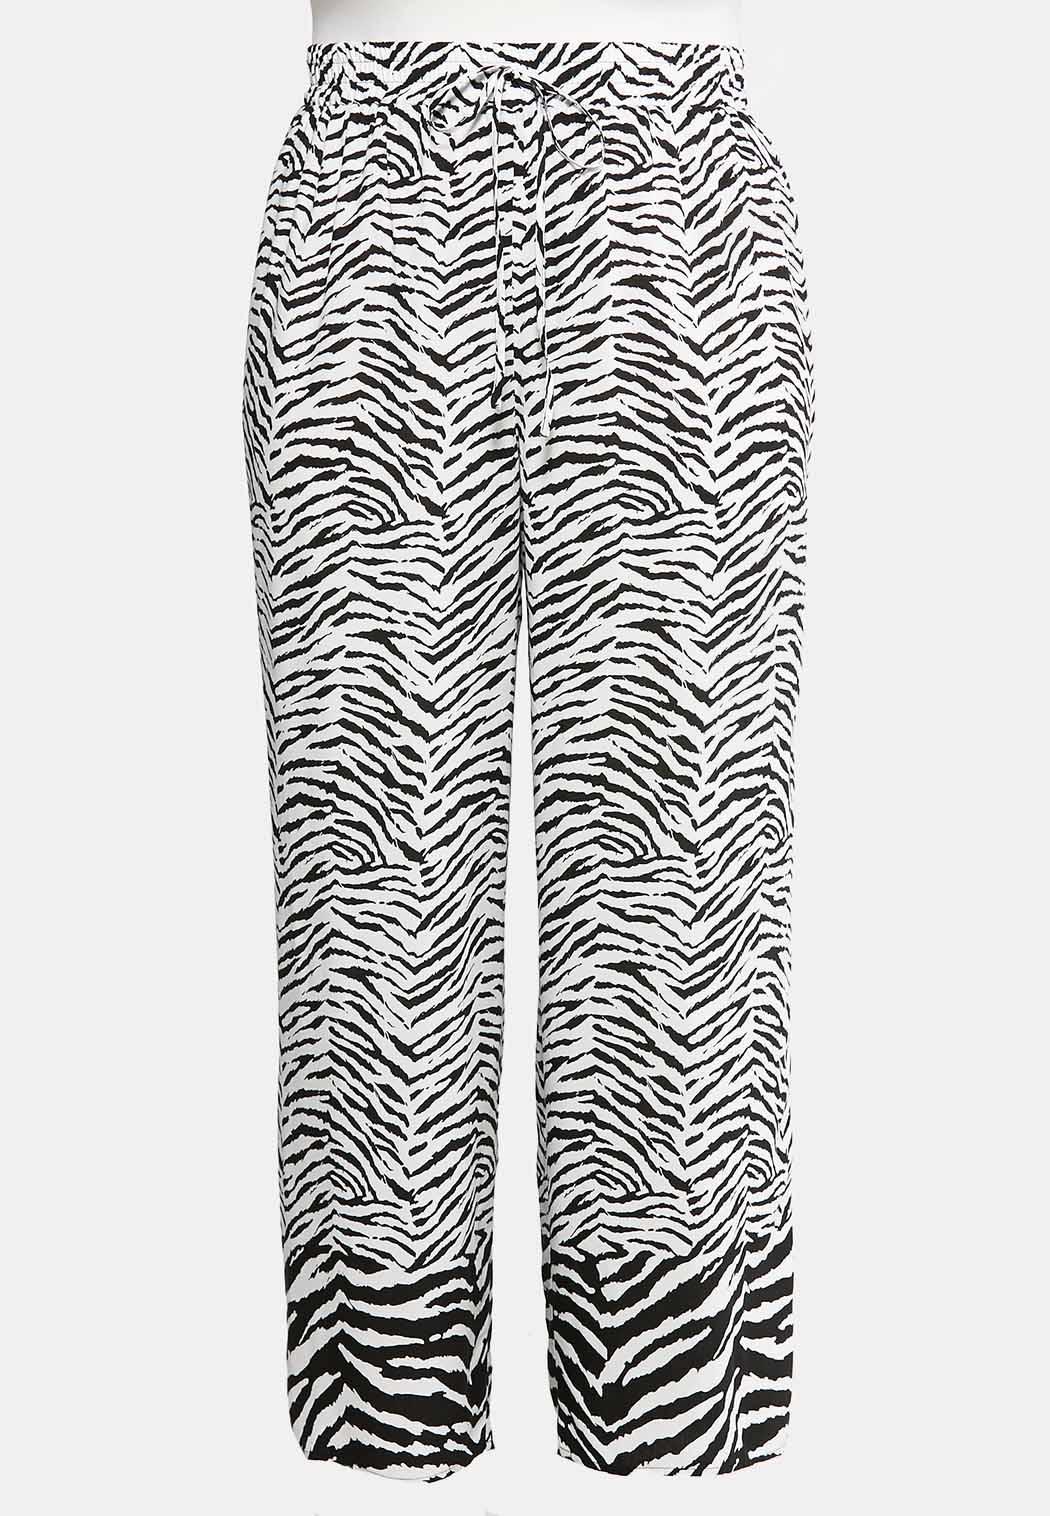 01ced066896bf0 Plus Size Zebra Palazzo Pants Pants Cato Fashions